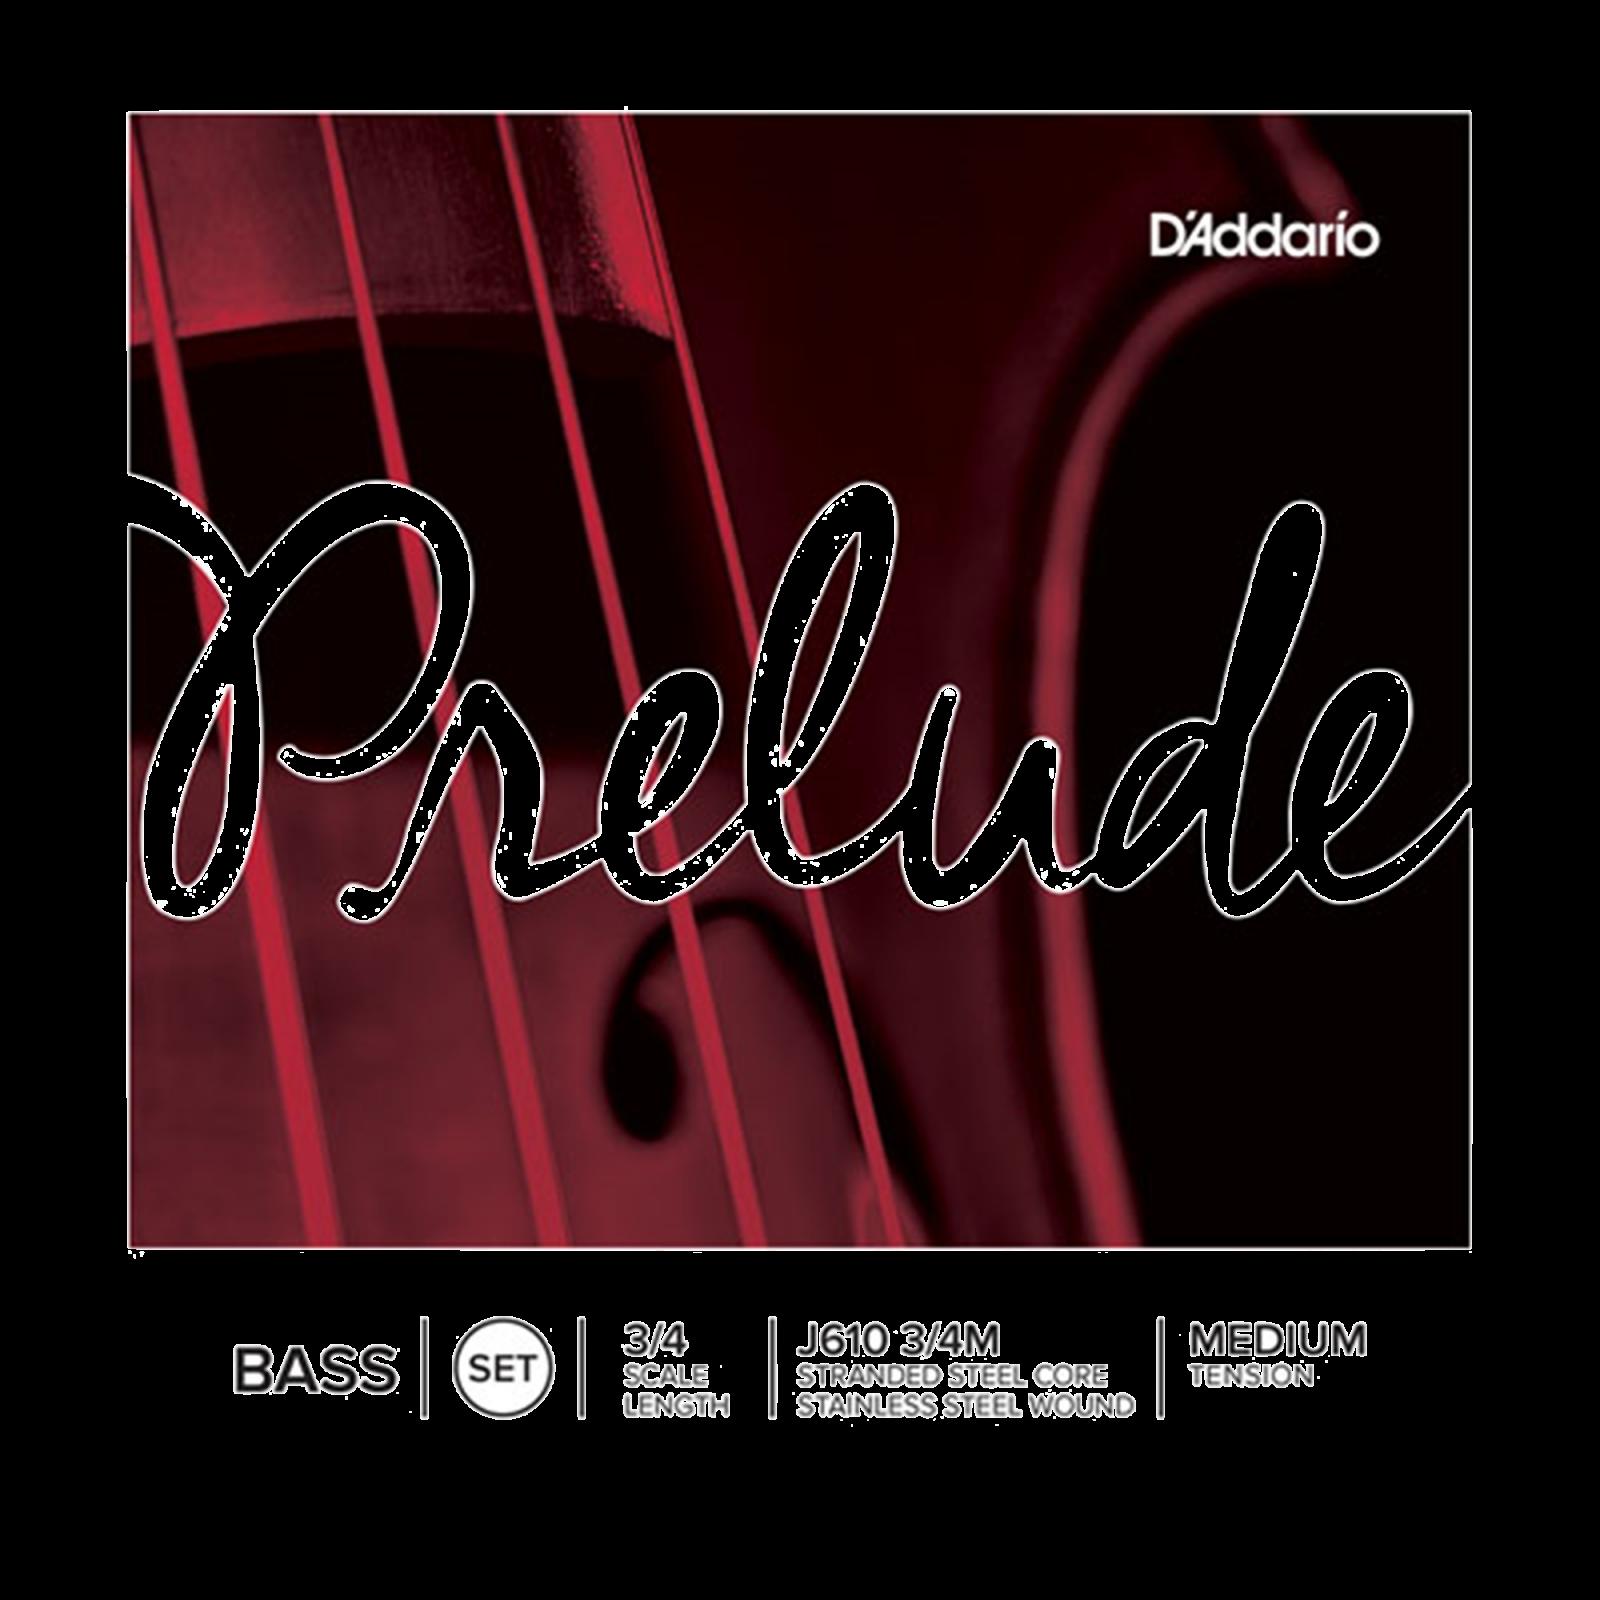 J610 3/4M Prelude Bass Strings, Set of 4, List $177